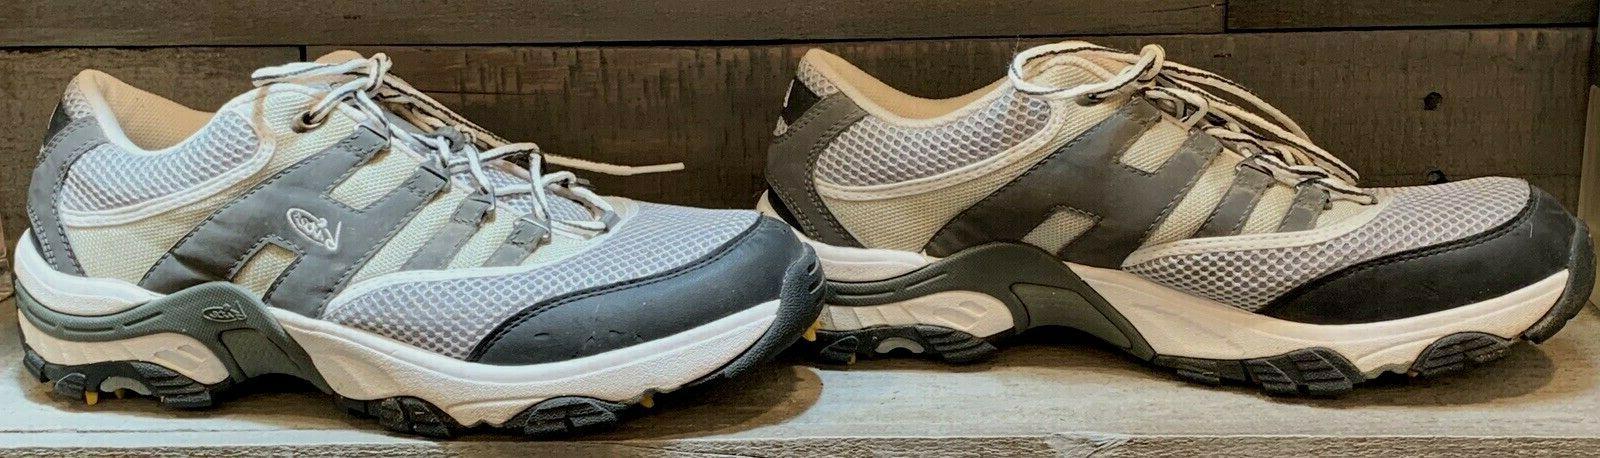 Mens Bite Shoe Size 10.5 Gray Taupe White Sneaker